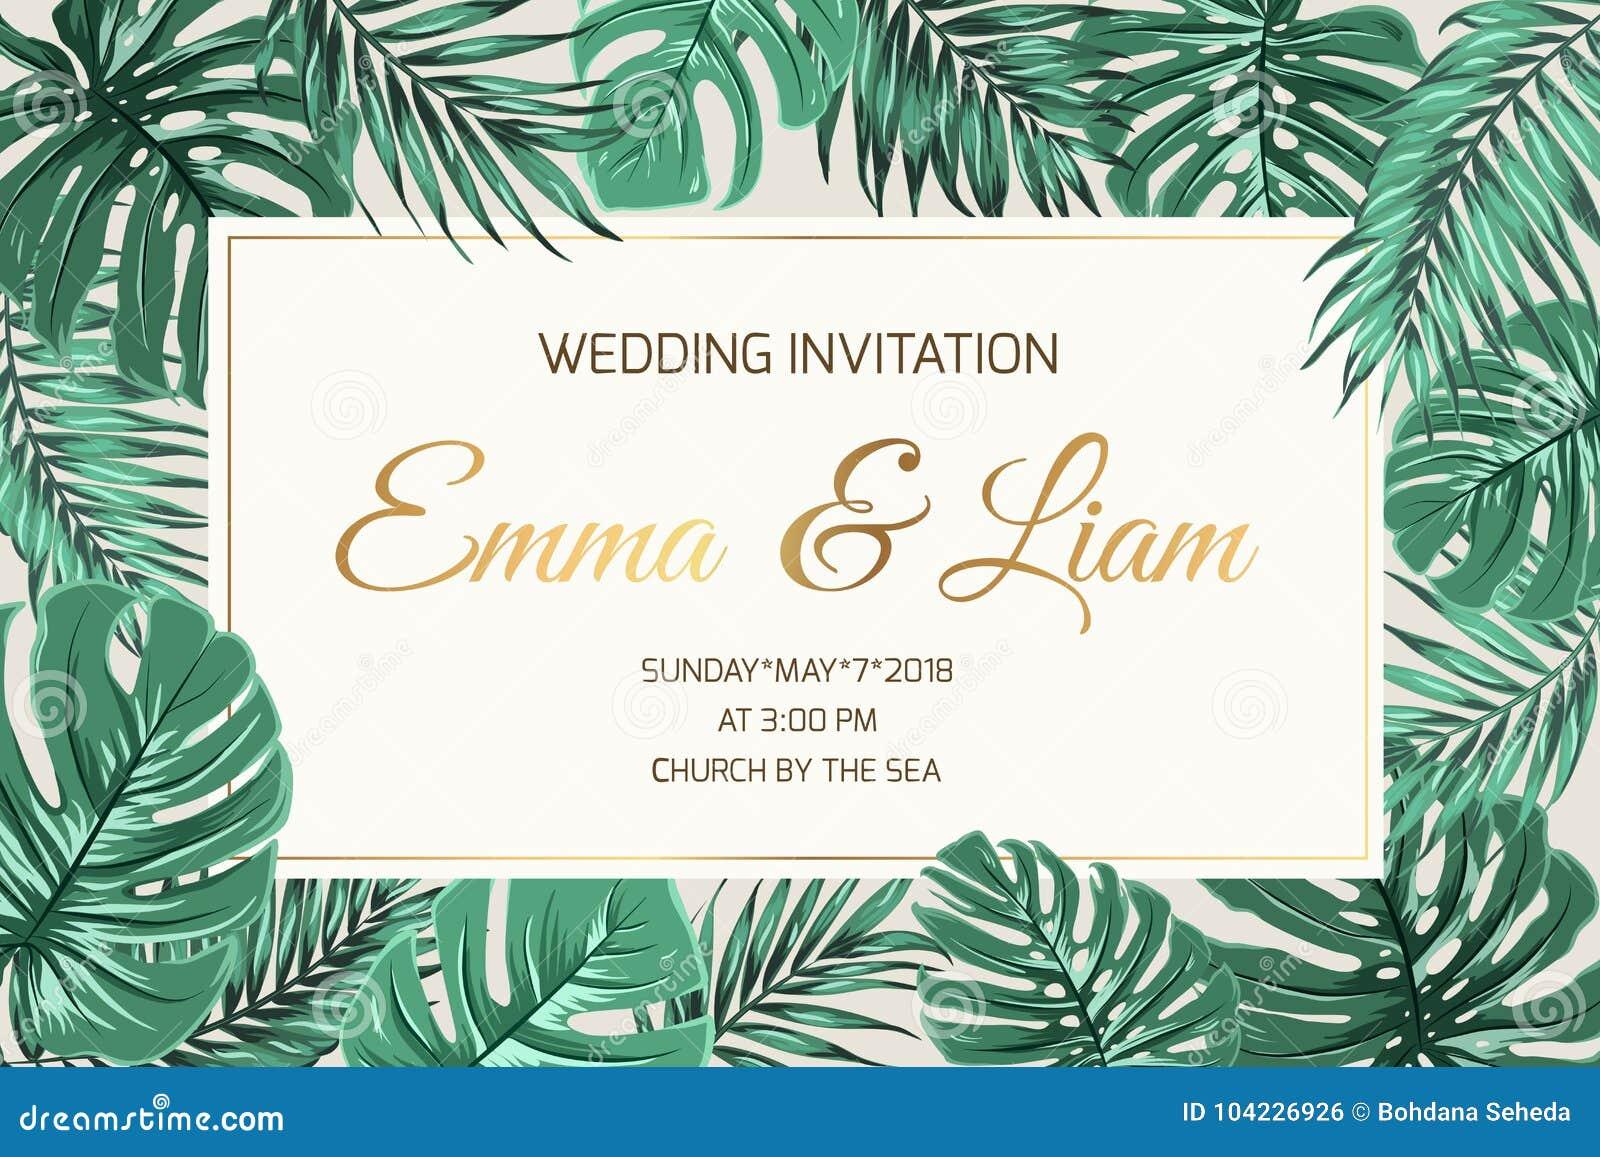 Wedding invitation exotic green leaves golden text stock vector wedding invitation exotic green leaves golden text stopboris Images